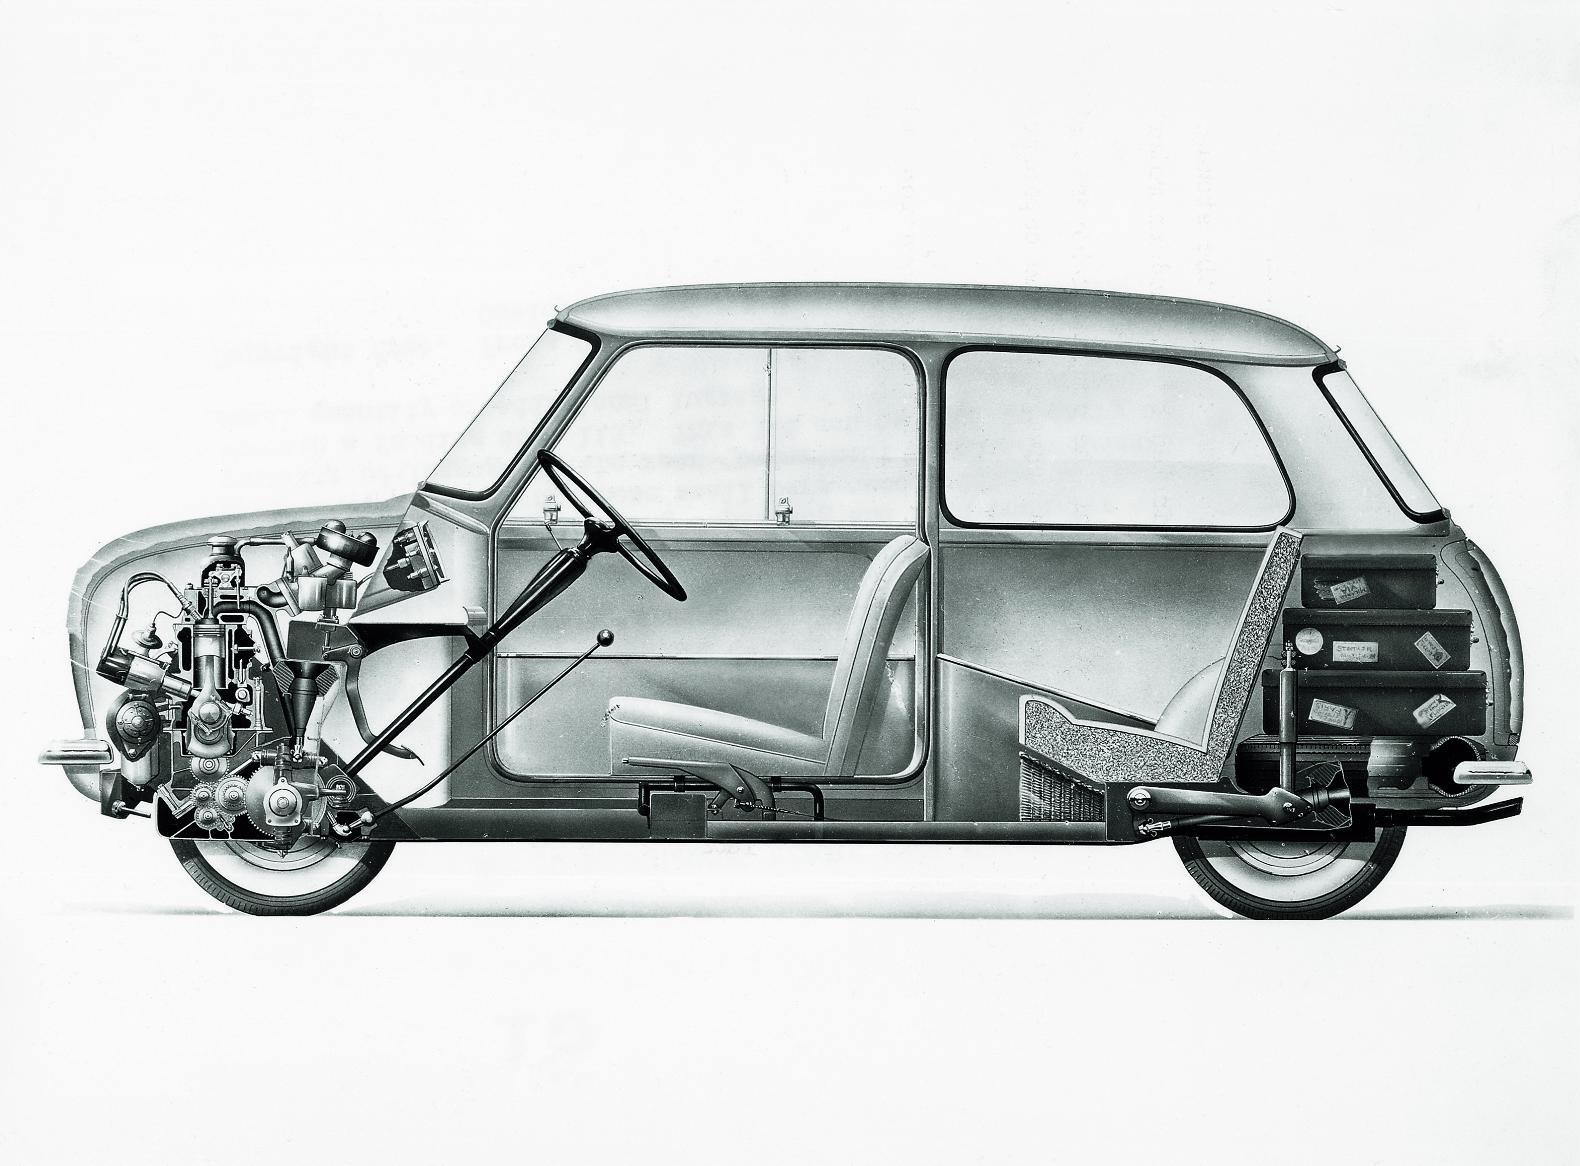 Mini, Austin Mini, Rover Mini, Classic Mini, Mini Buying guide, Mini cutaway